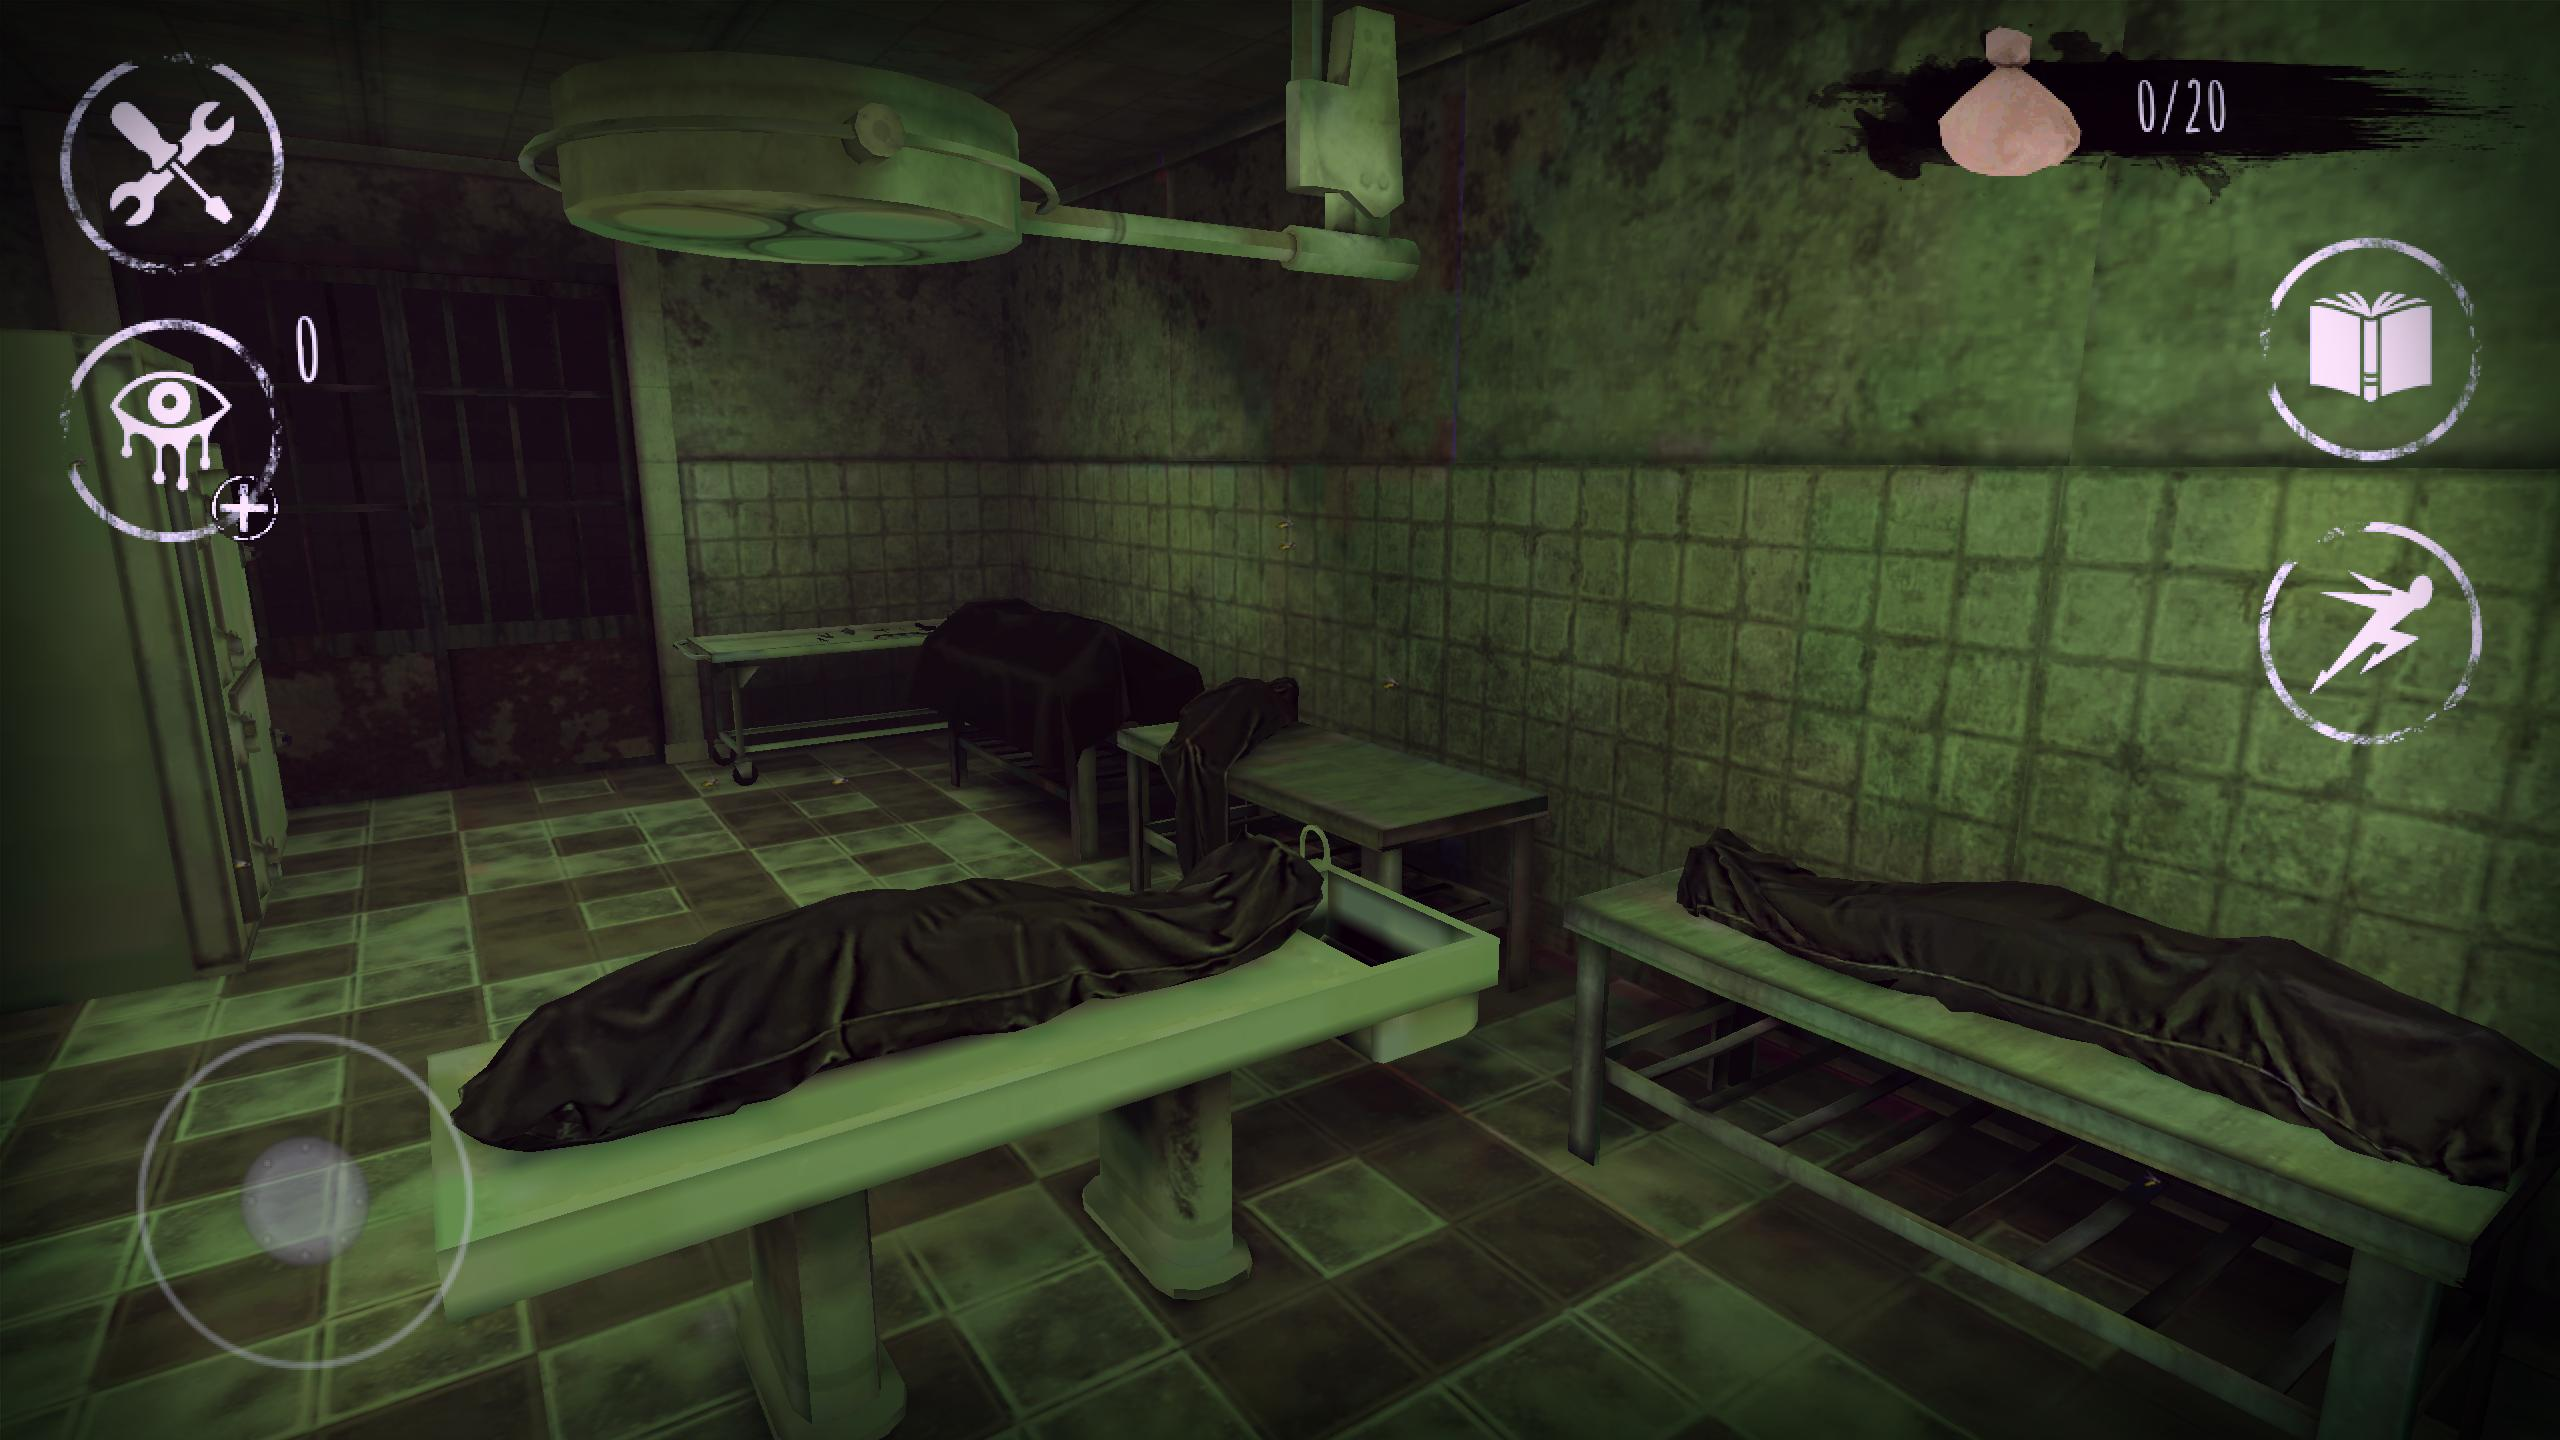 Eyes: Scary Thriller - Creepy Horror Game 6.1.21 Screenshot 2